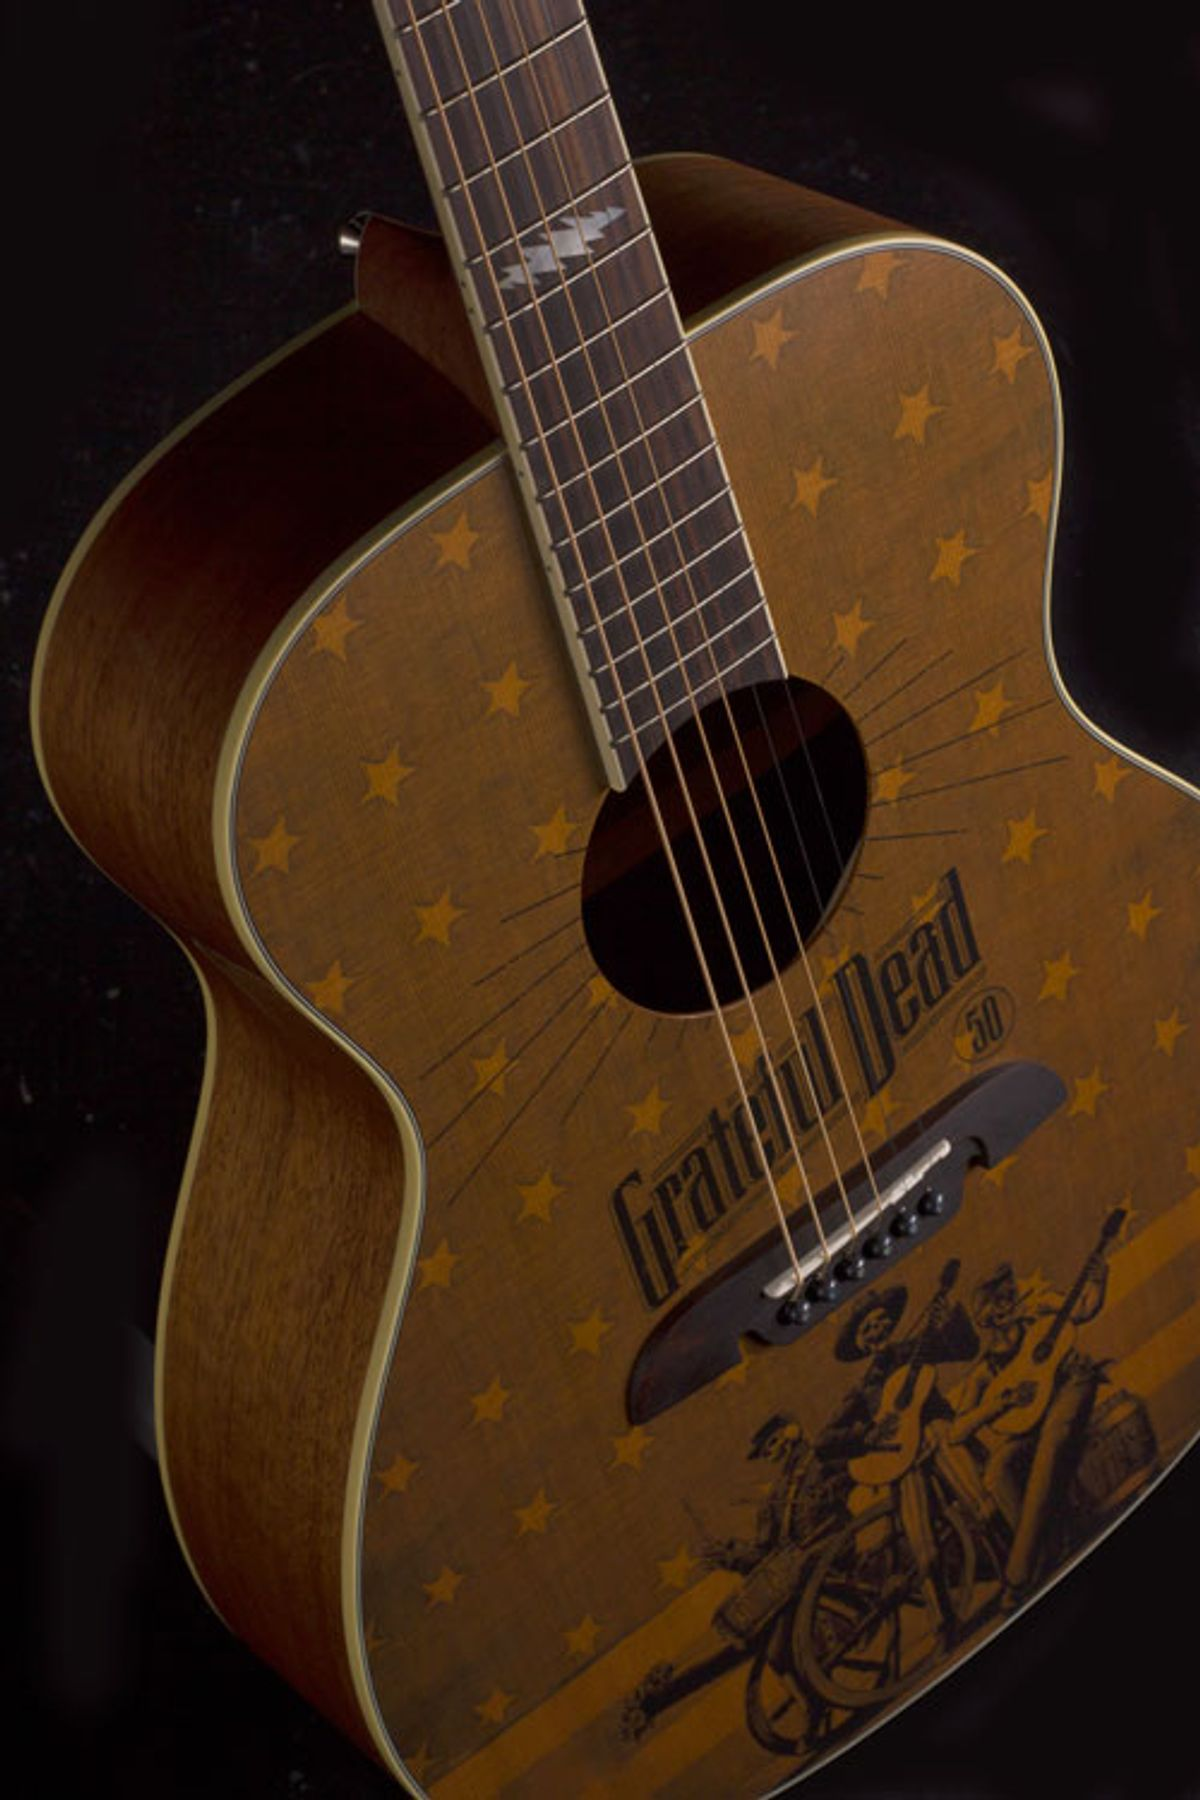 Alvarez Guitars Unveils the Grateful Dead Series